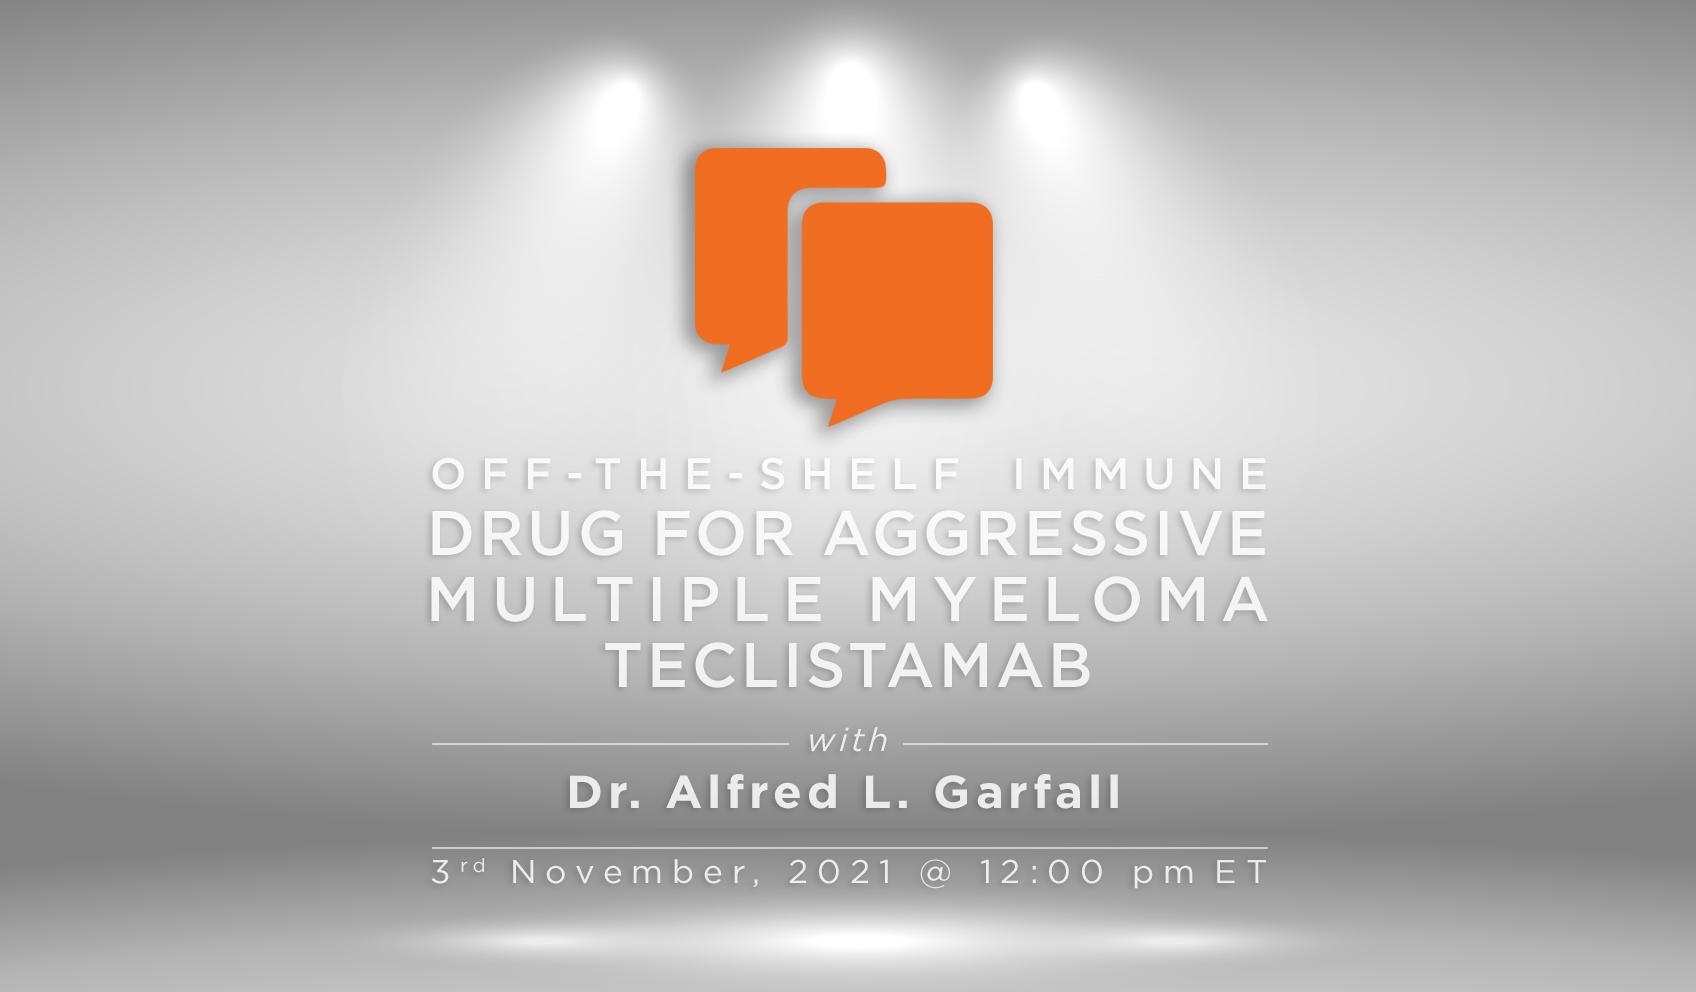 Off-the-shelf Immune Drug for Aggressive Multiple Myeloma: Teclistamab